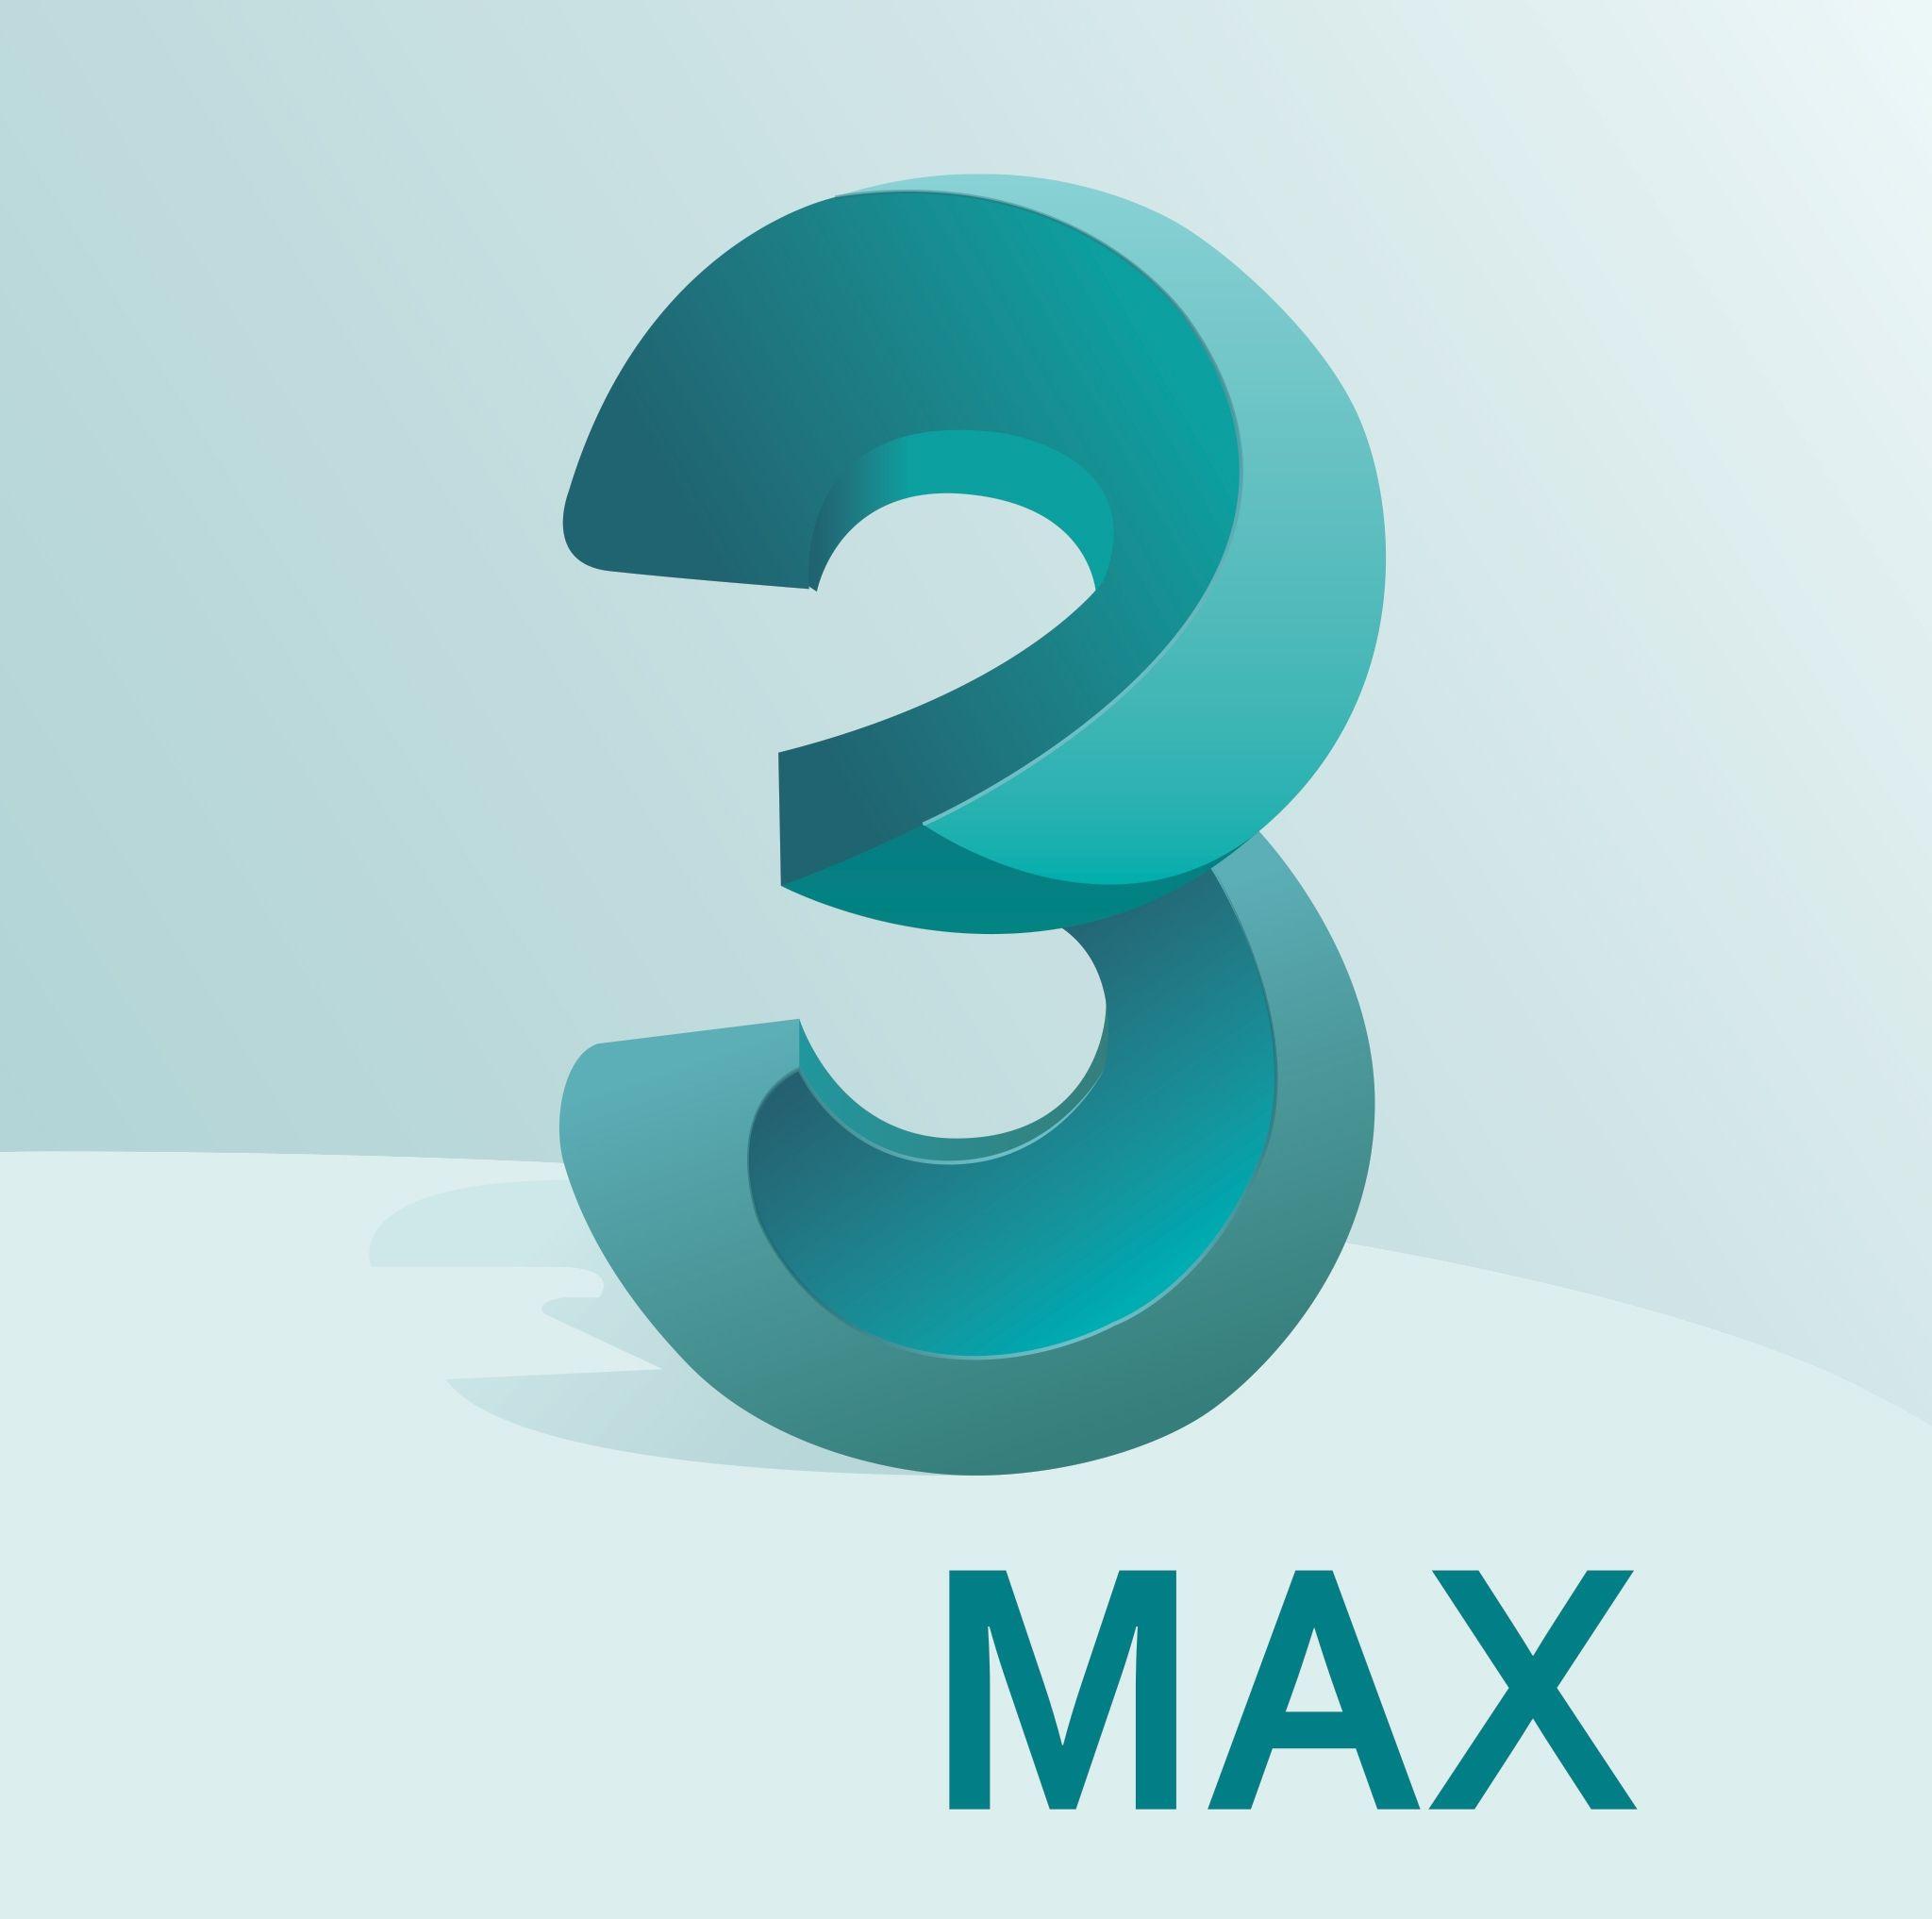 vray next , 3ds max 2019 , آموزش 3d max , آموزش پلاگین , vray, تری دی مکس , معماری , آموزش 3d Max, آموزش پلاگین V-Ray ,پلاگینvray next, آموزش کاربردی تری دی مکس